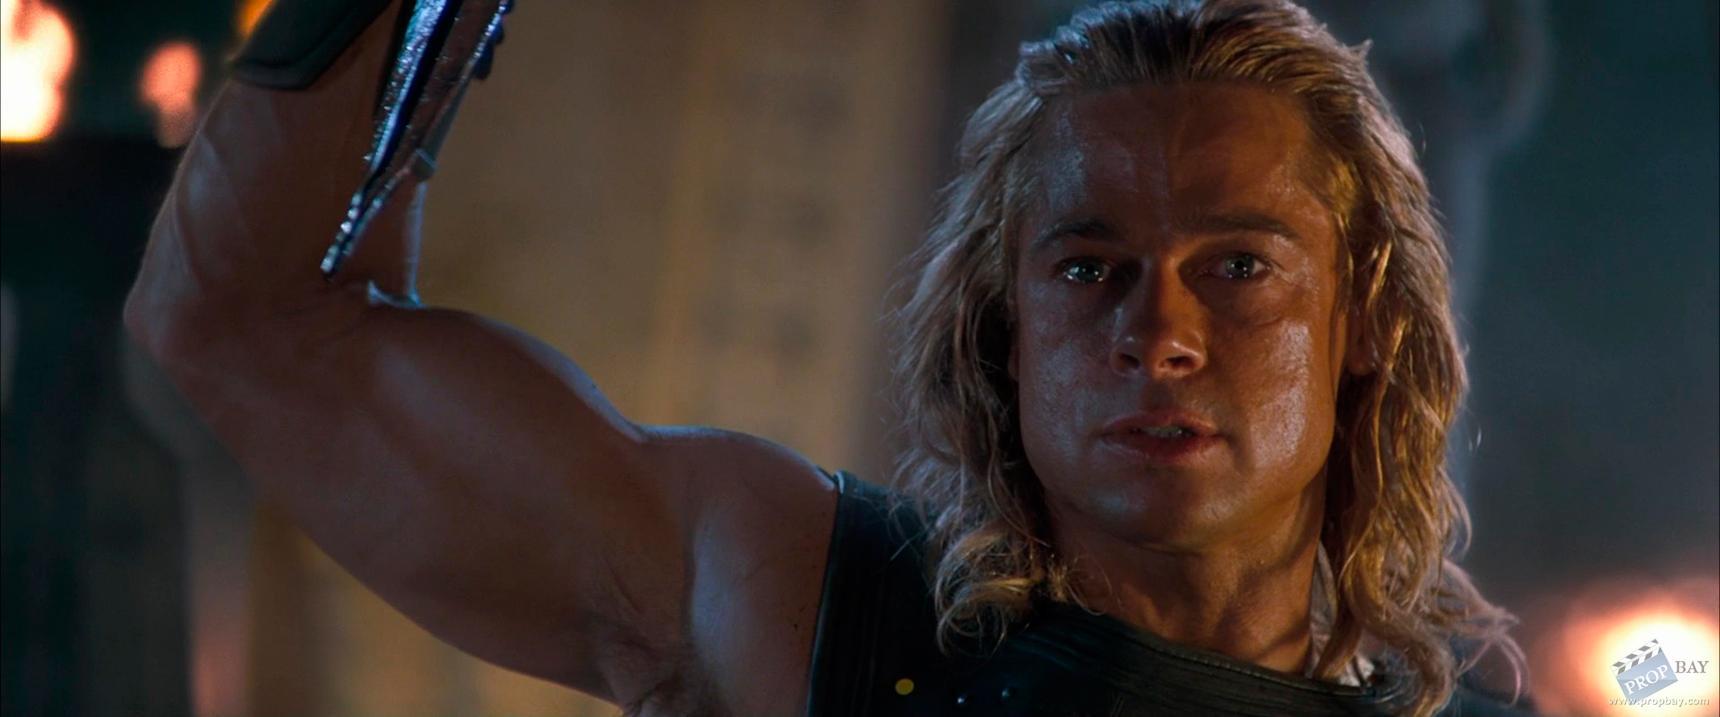 Achilles Brad Pitt Item Details